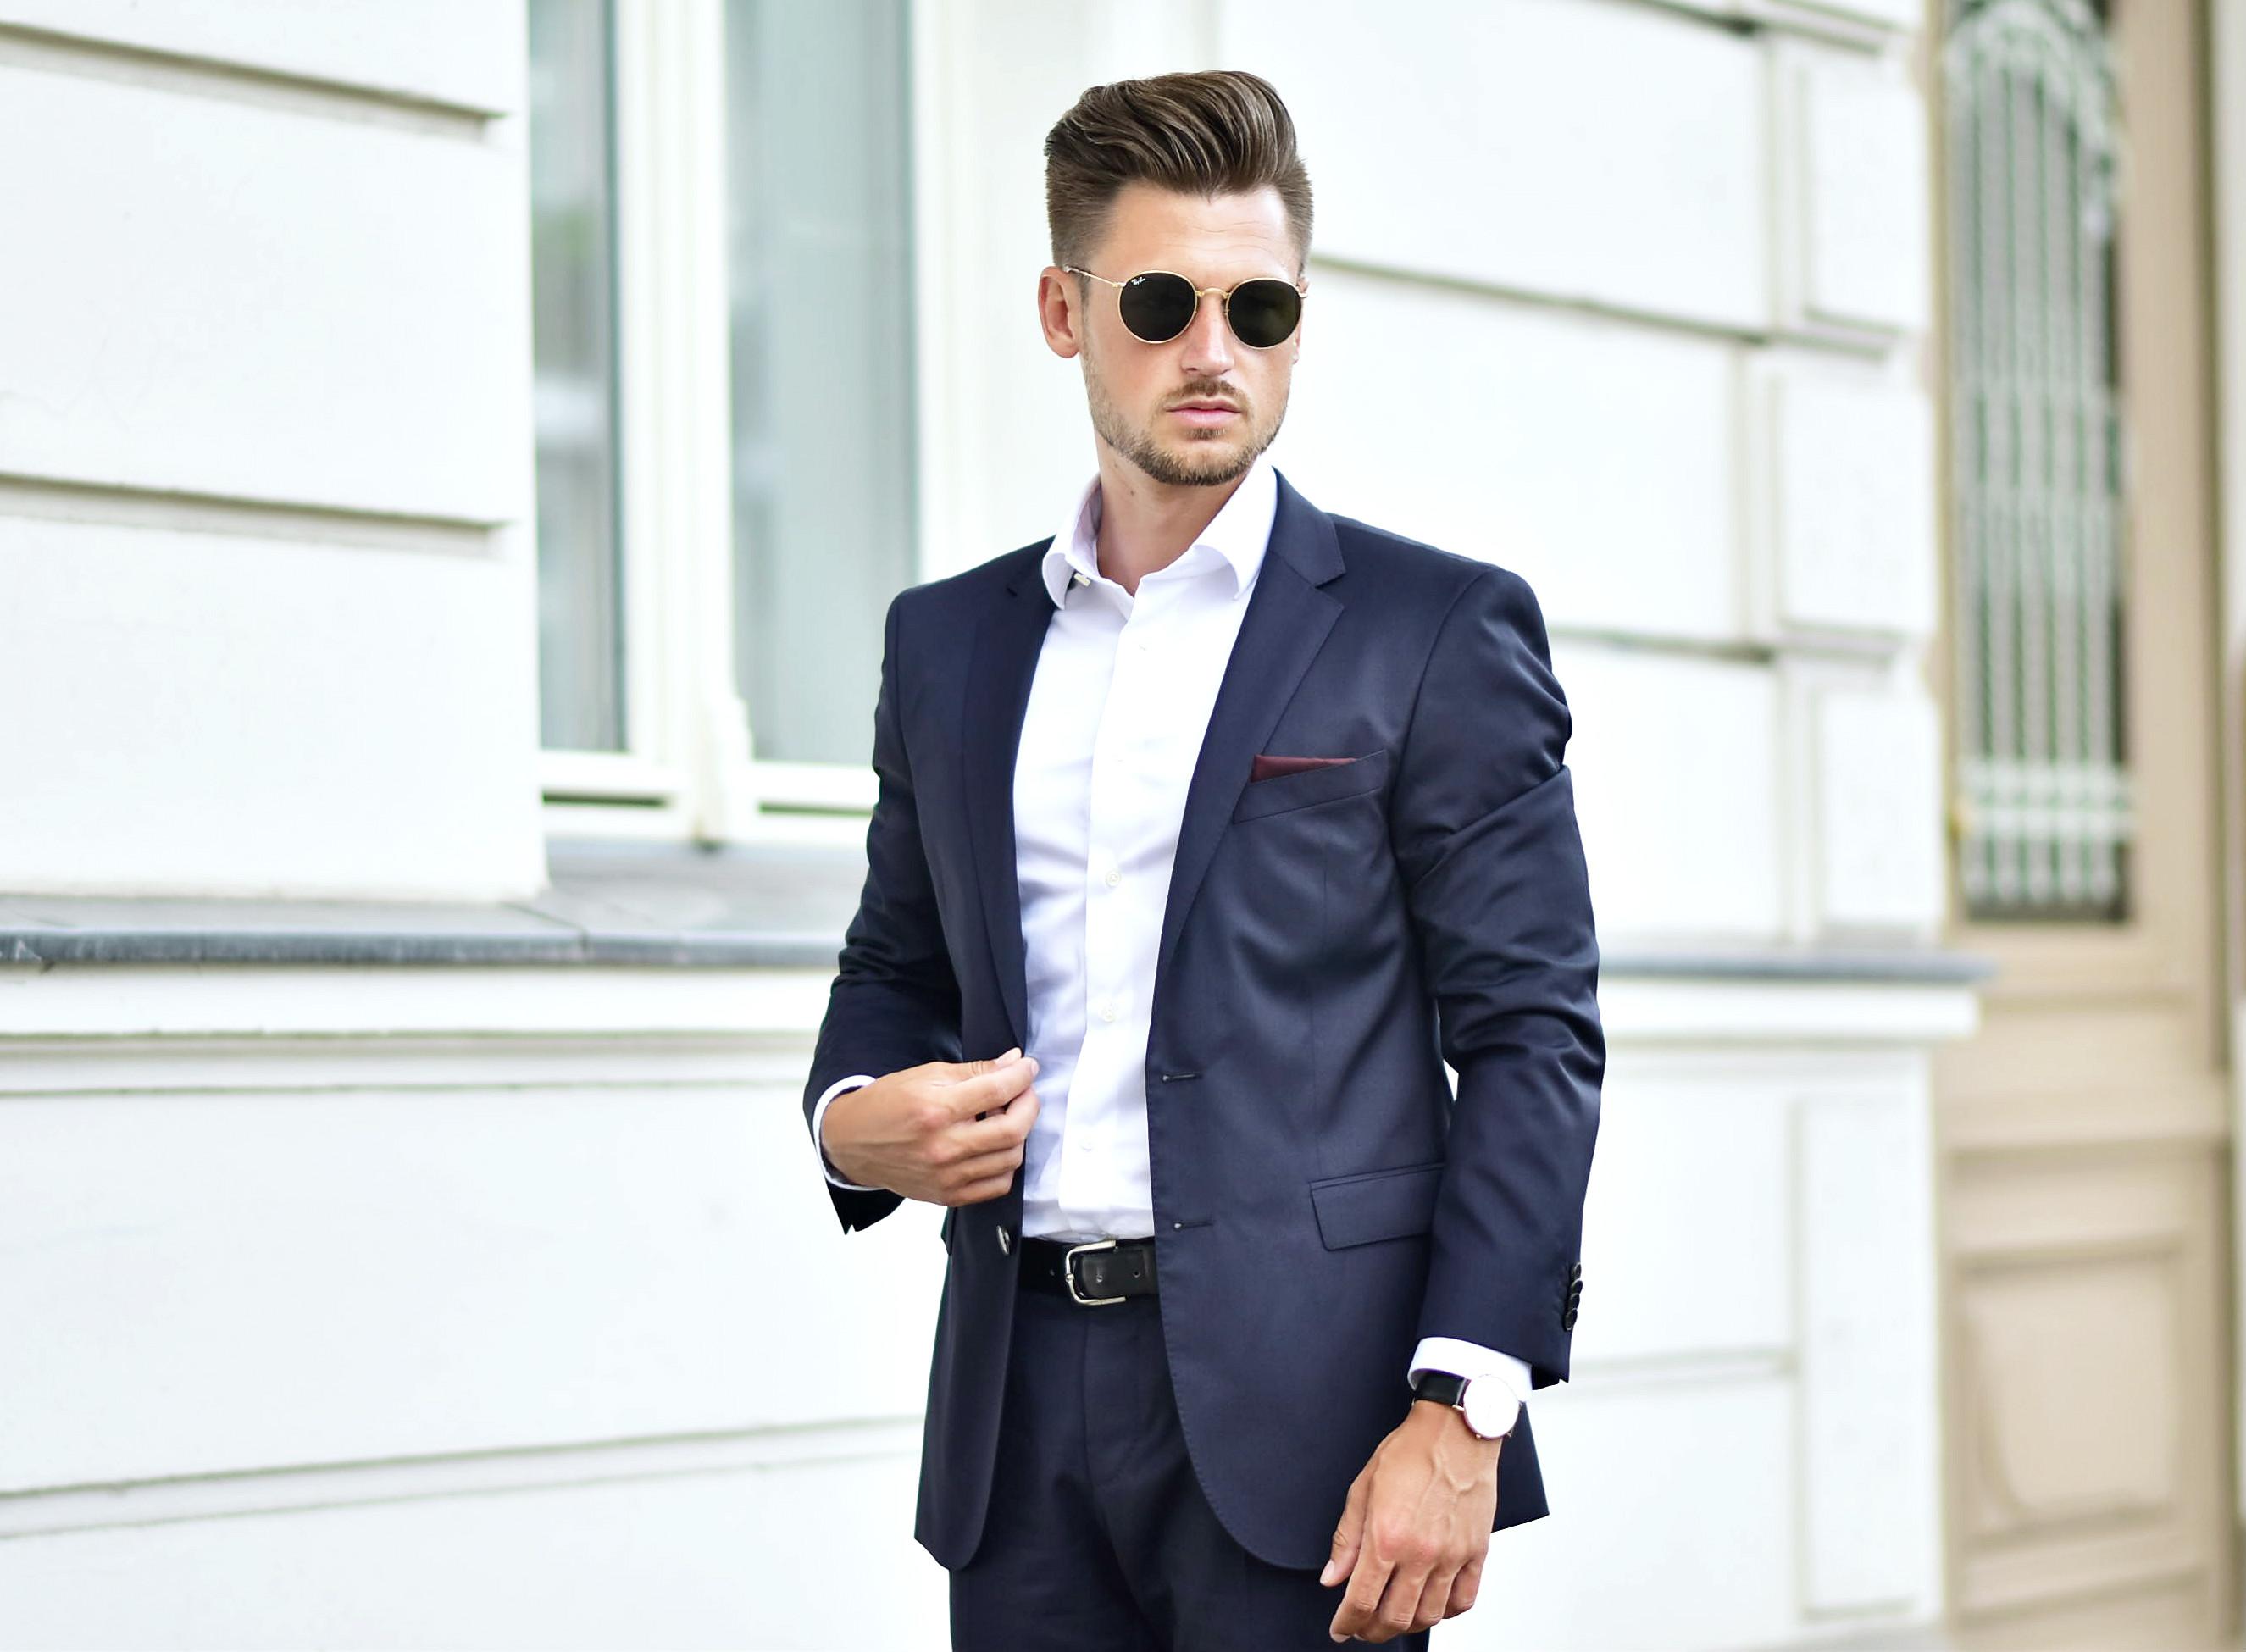 Tommeezjerry-Styleblog-Männerblog-Männer-Modeblog-Berlin-Berlinblog-Männermodeblog-Outfit-Classy-Chic-Suit-Anzug-Hugo-Boss-Nationalmannschaft-Deutschland-Marineblau-Suit-Up-Fashion-Week-Berlin-Sommer-2016